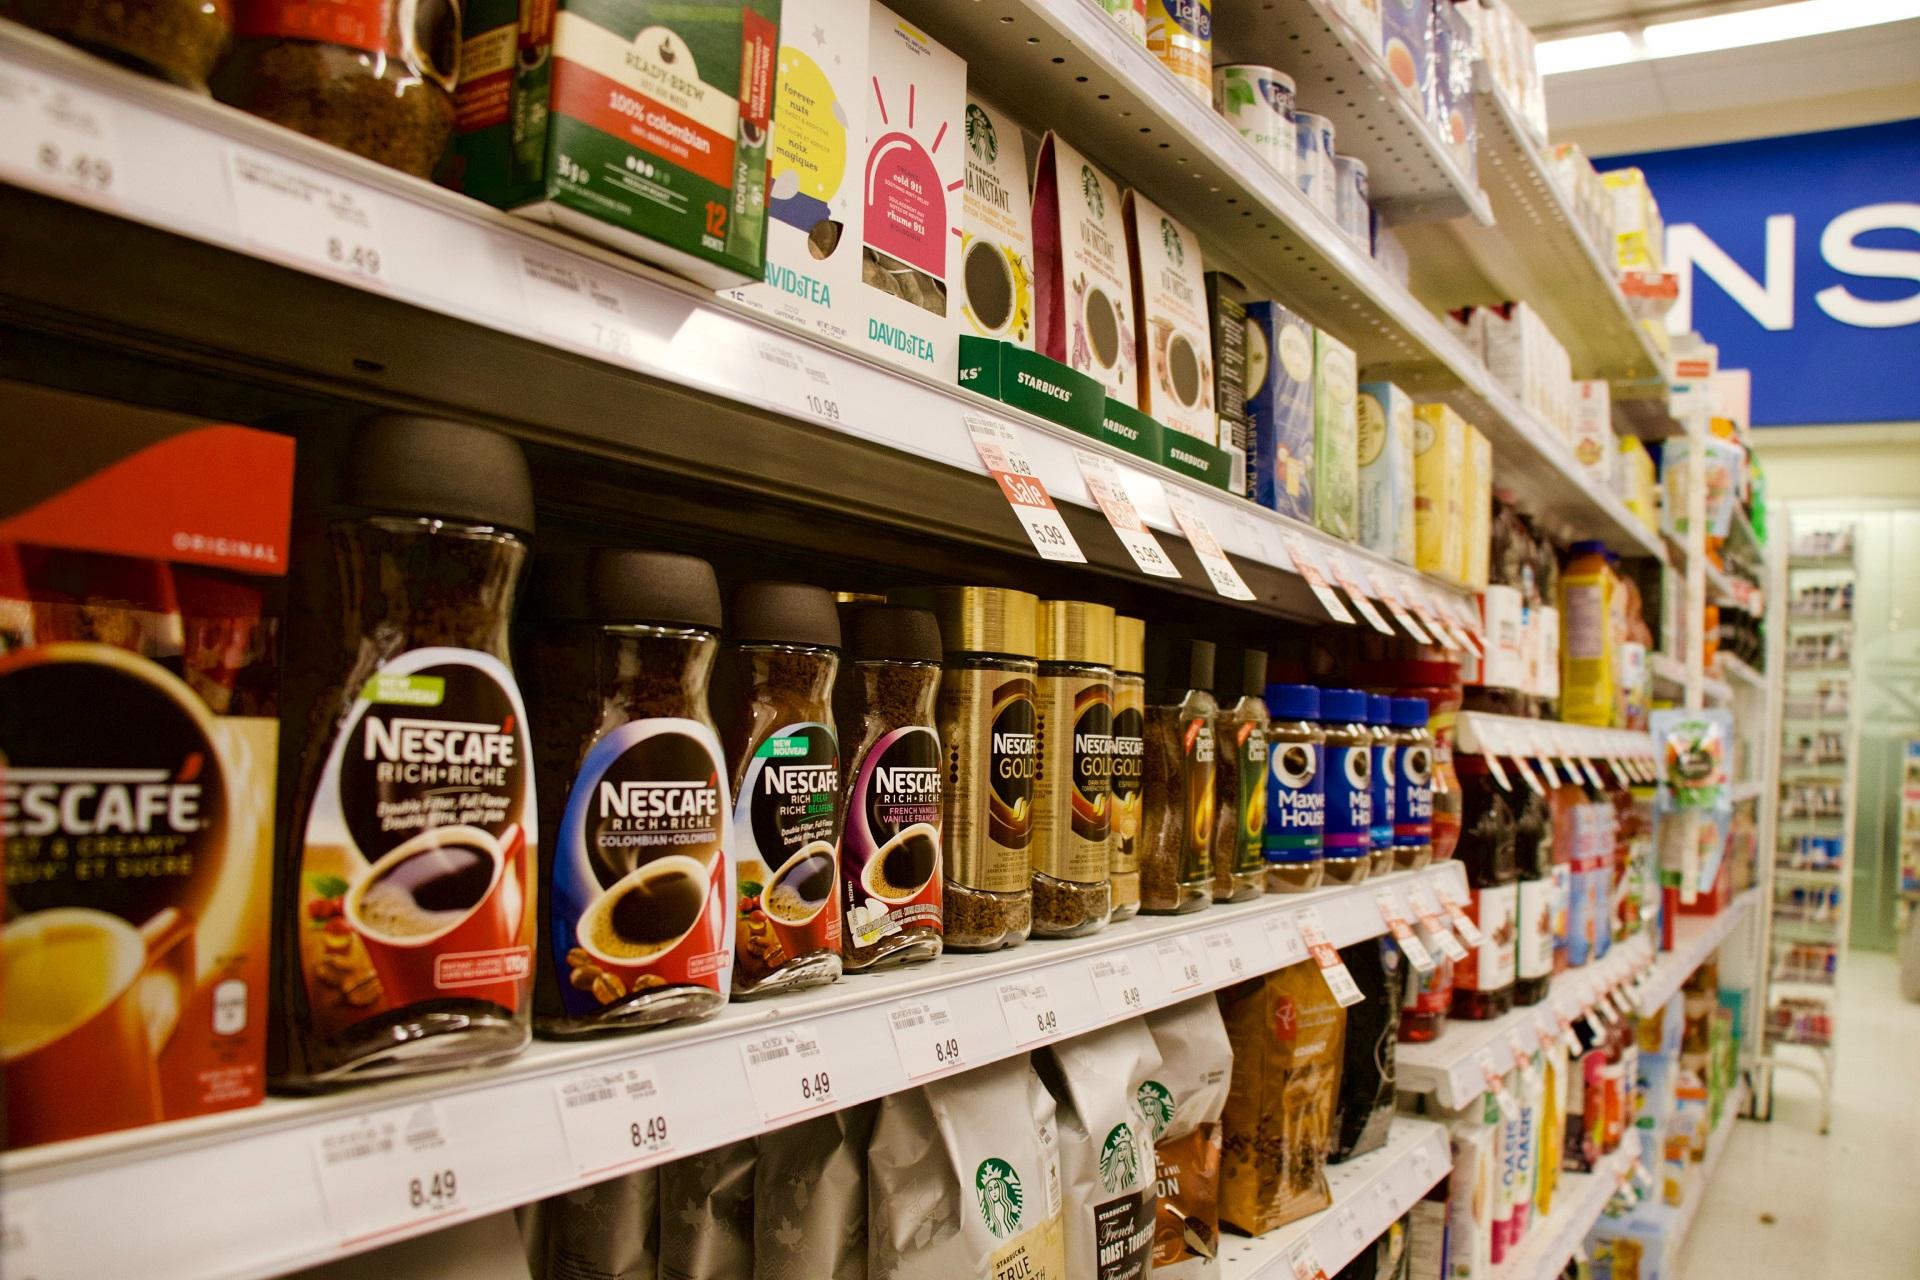 compras-online-supermercado-delivery-lima-peru-urbansuv